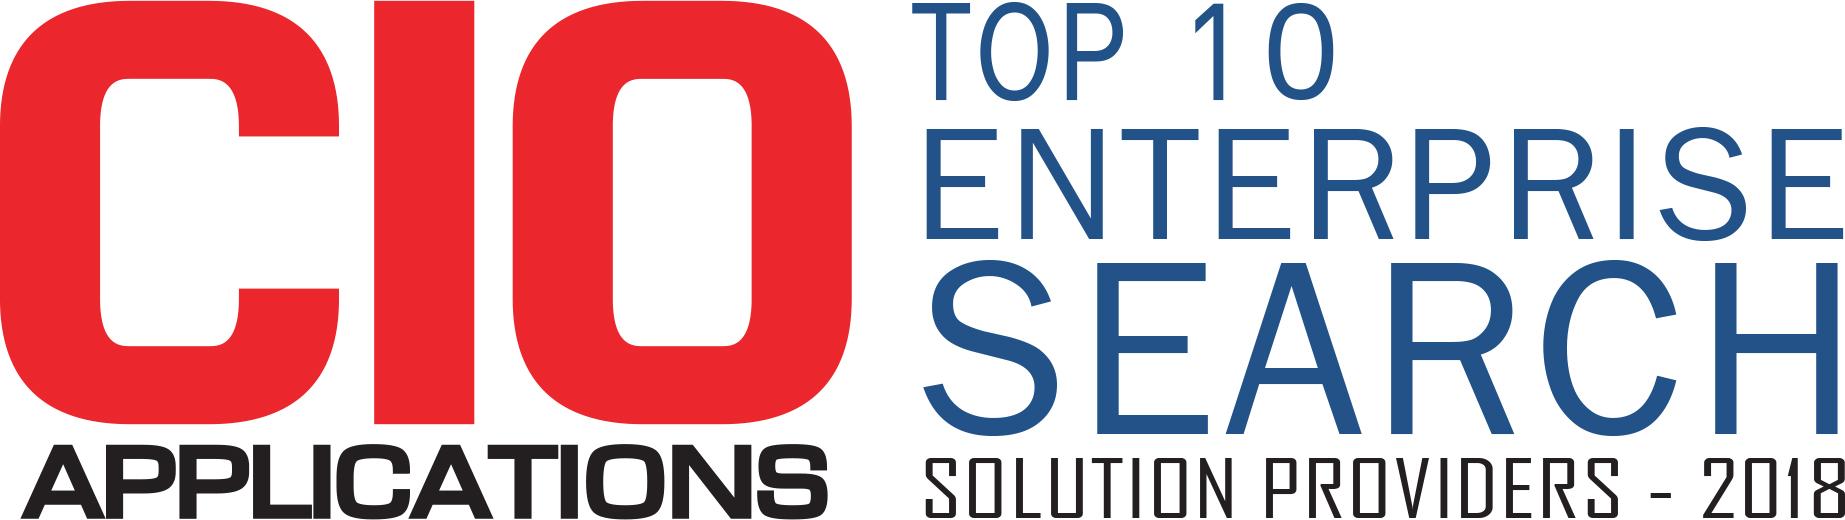 Top Companies Providing Enterprise Search Solution 2018